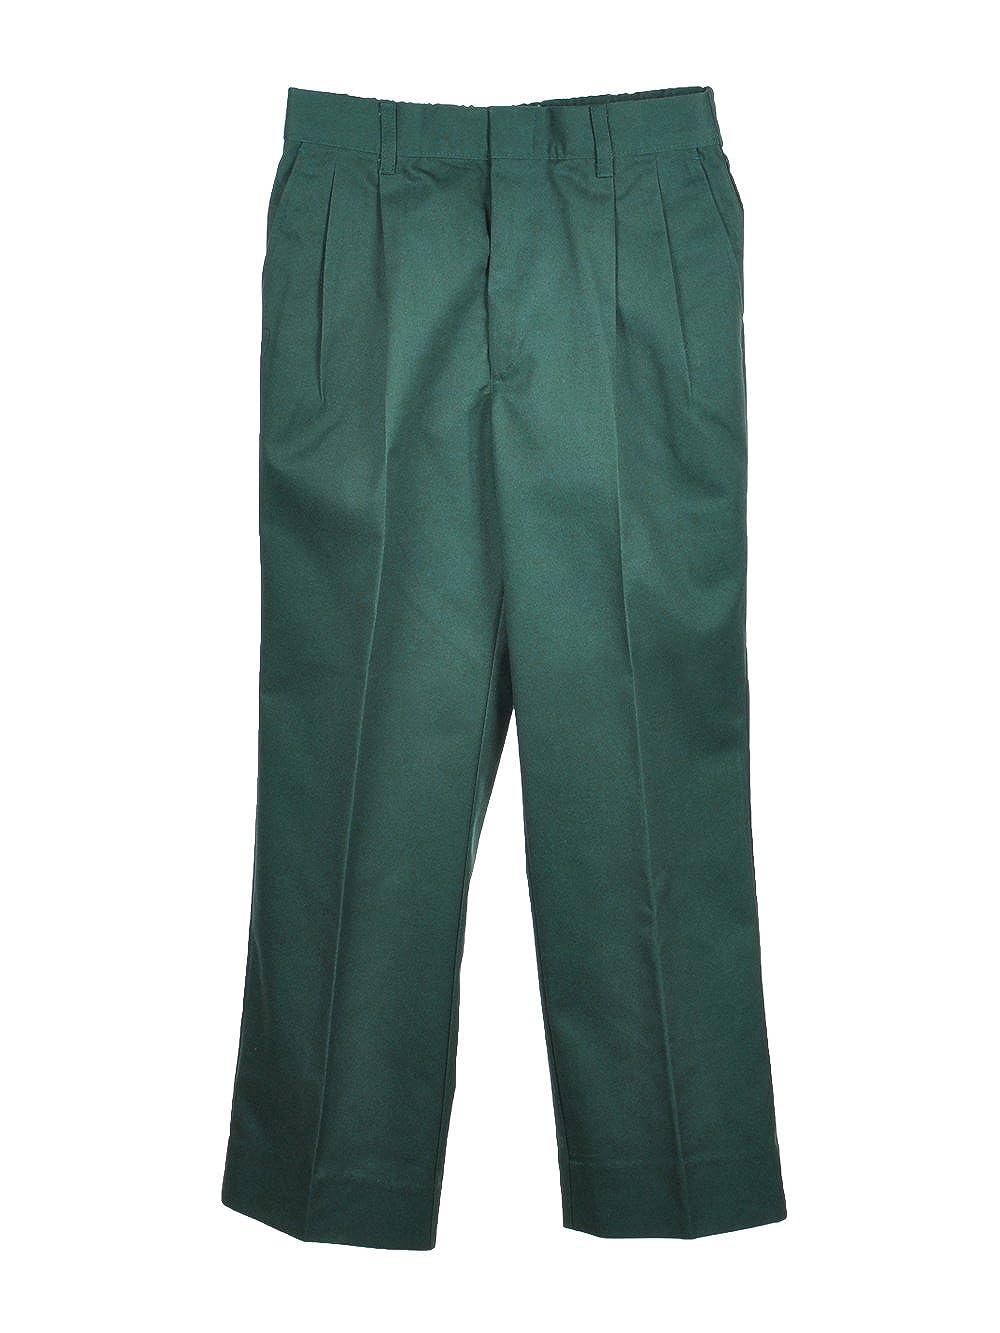 Rifle Big Boys Husky Pleated Pants